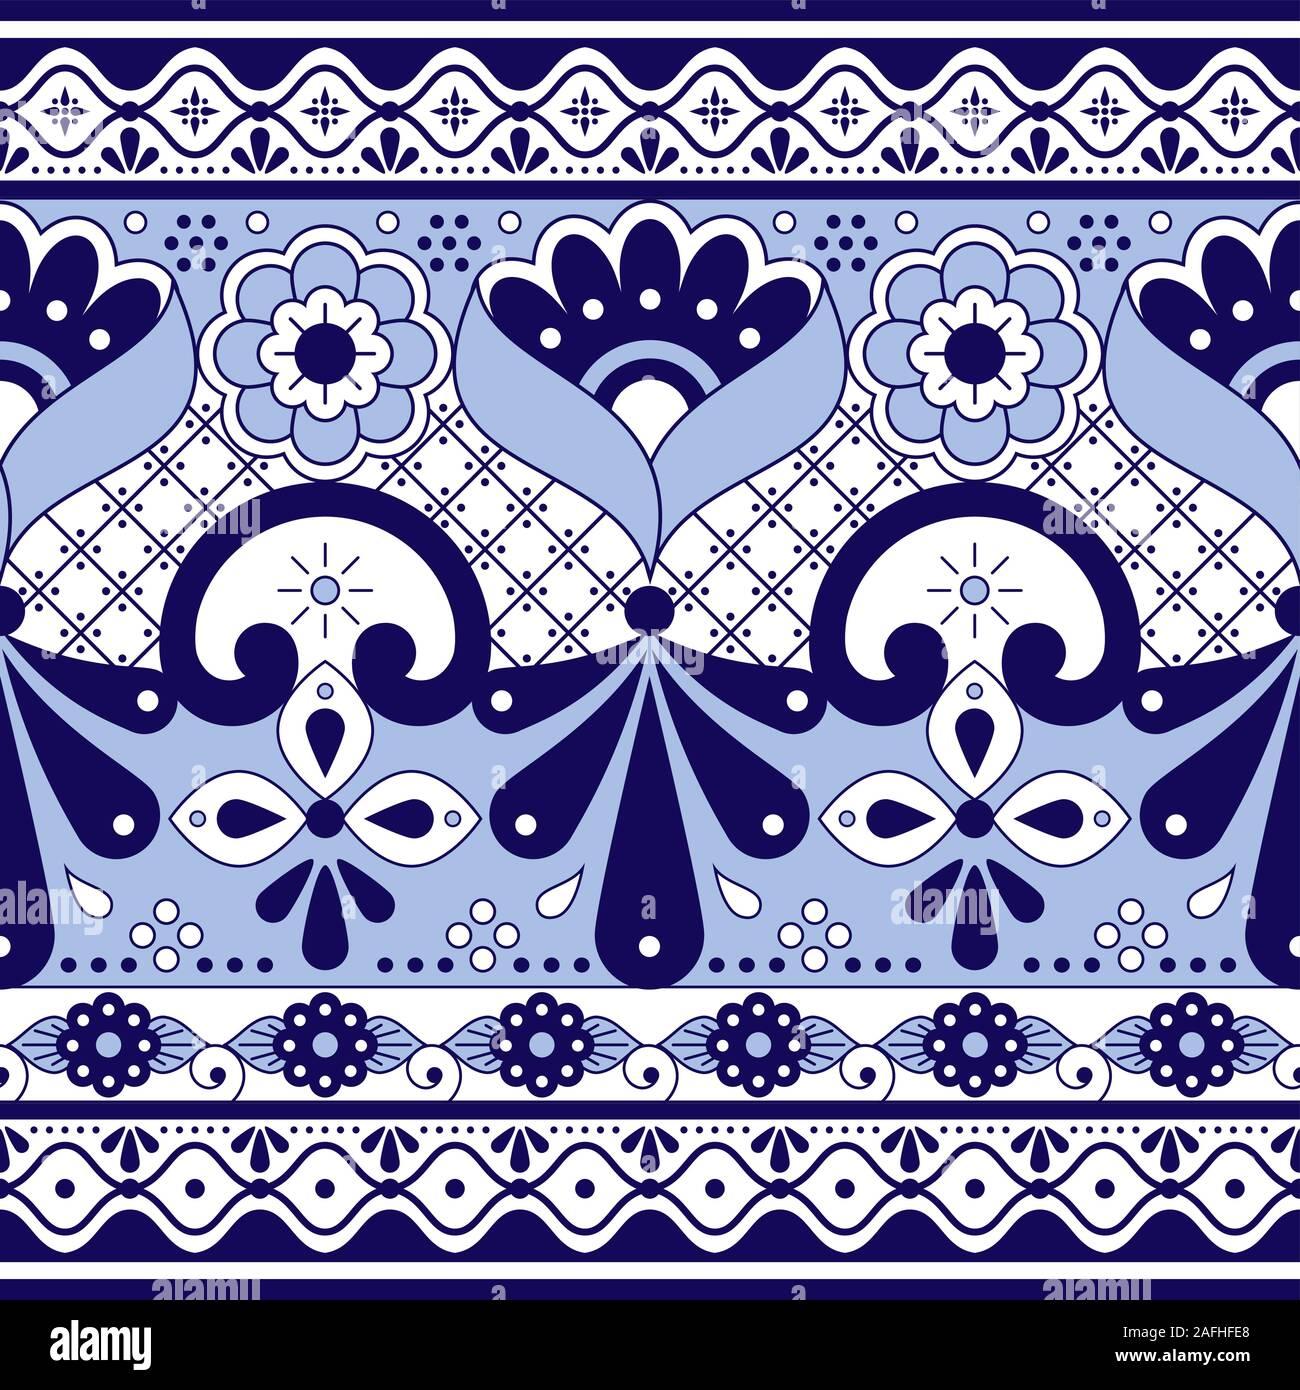 Virgin of Guadalupe Mexico Medium Handpainted Tile Purple